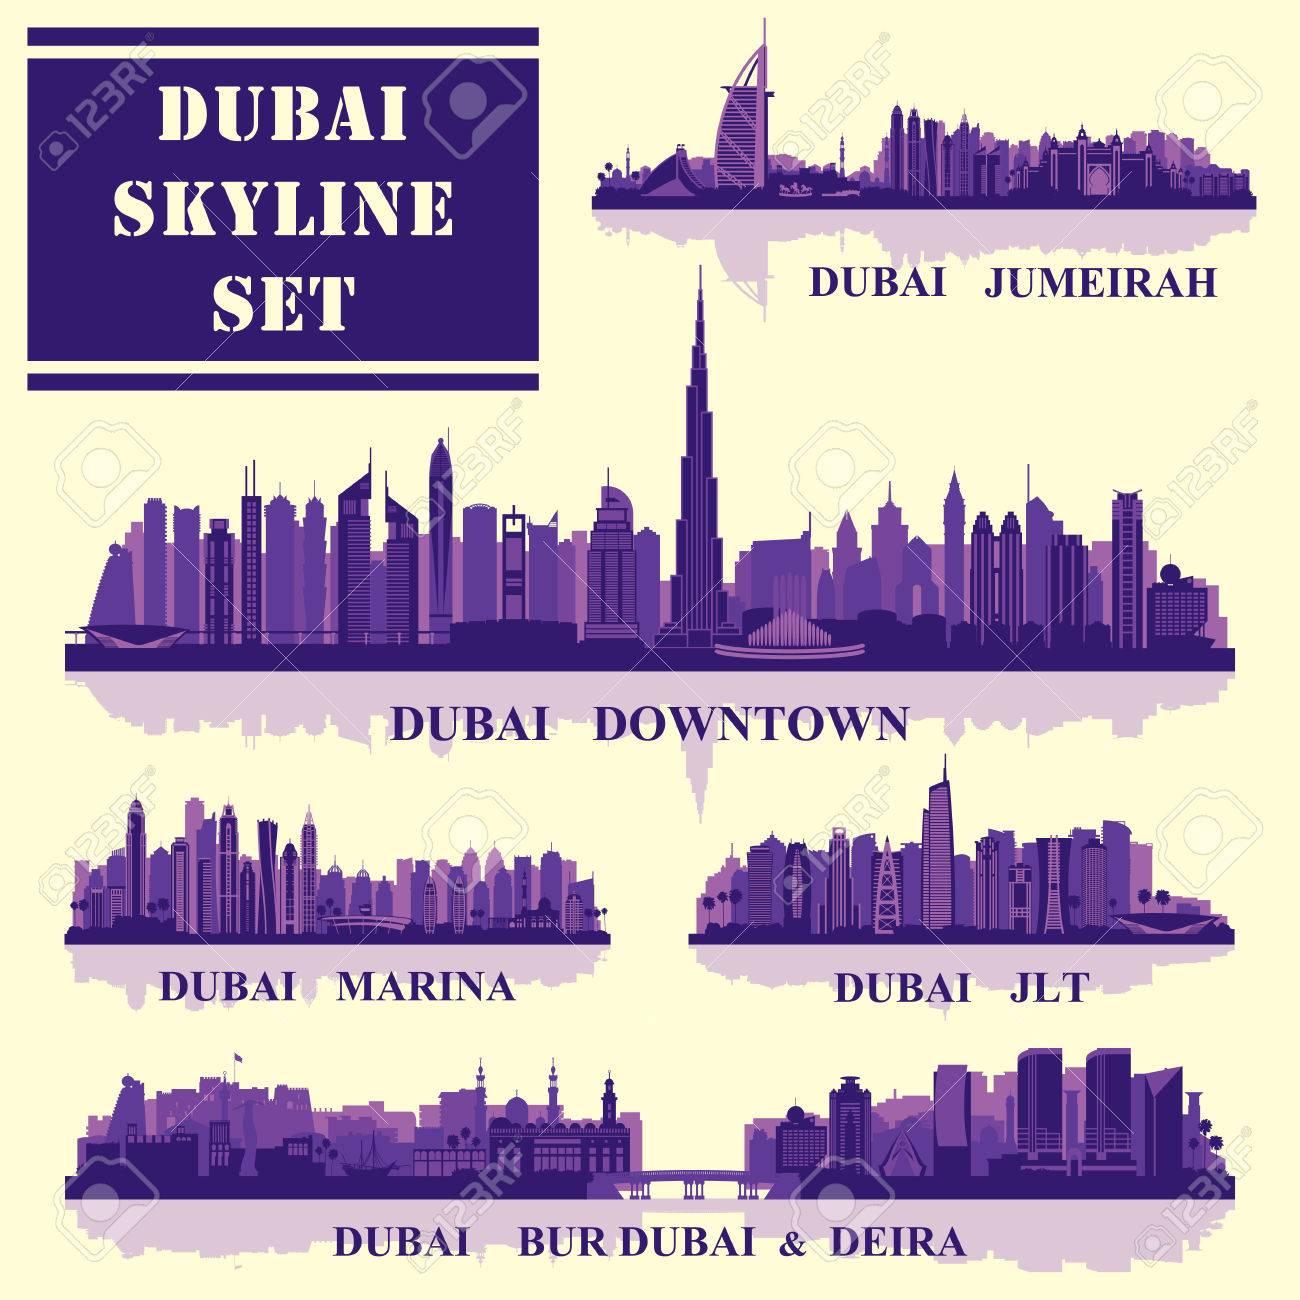 Set of Dubai districts, vector illustration - 55014783